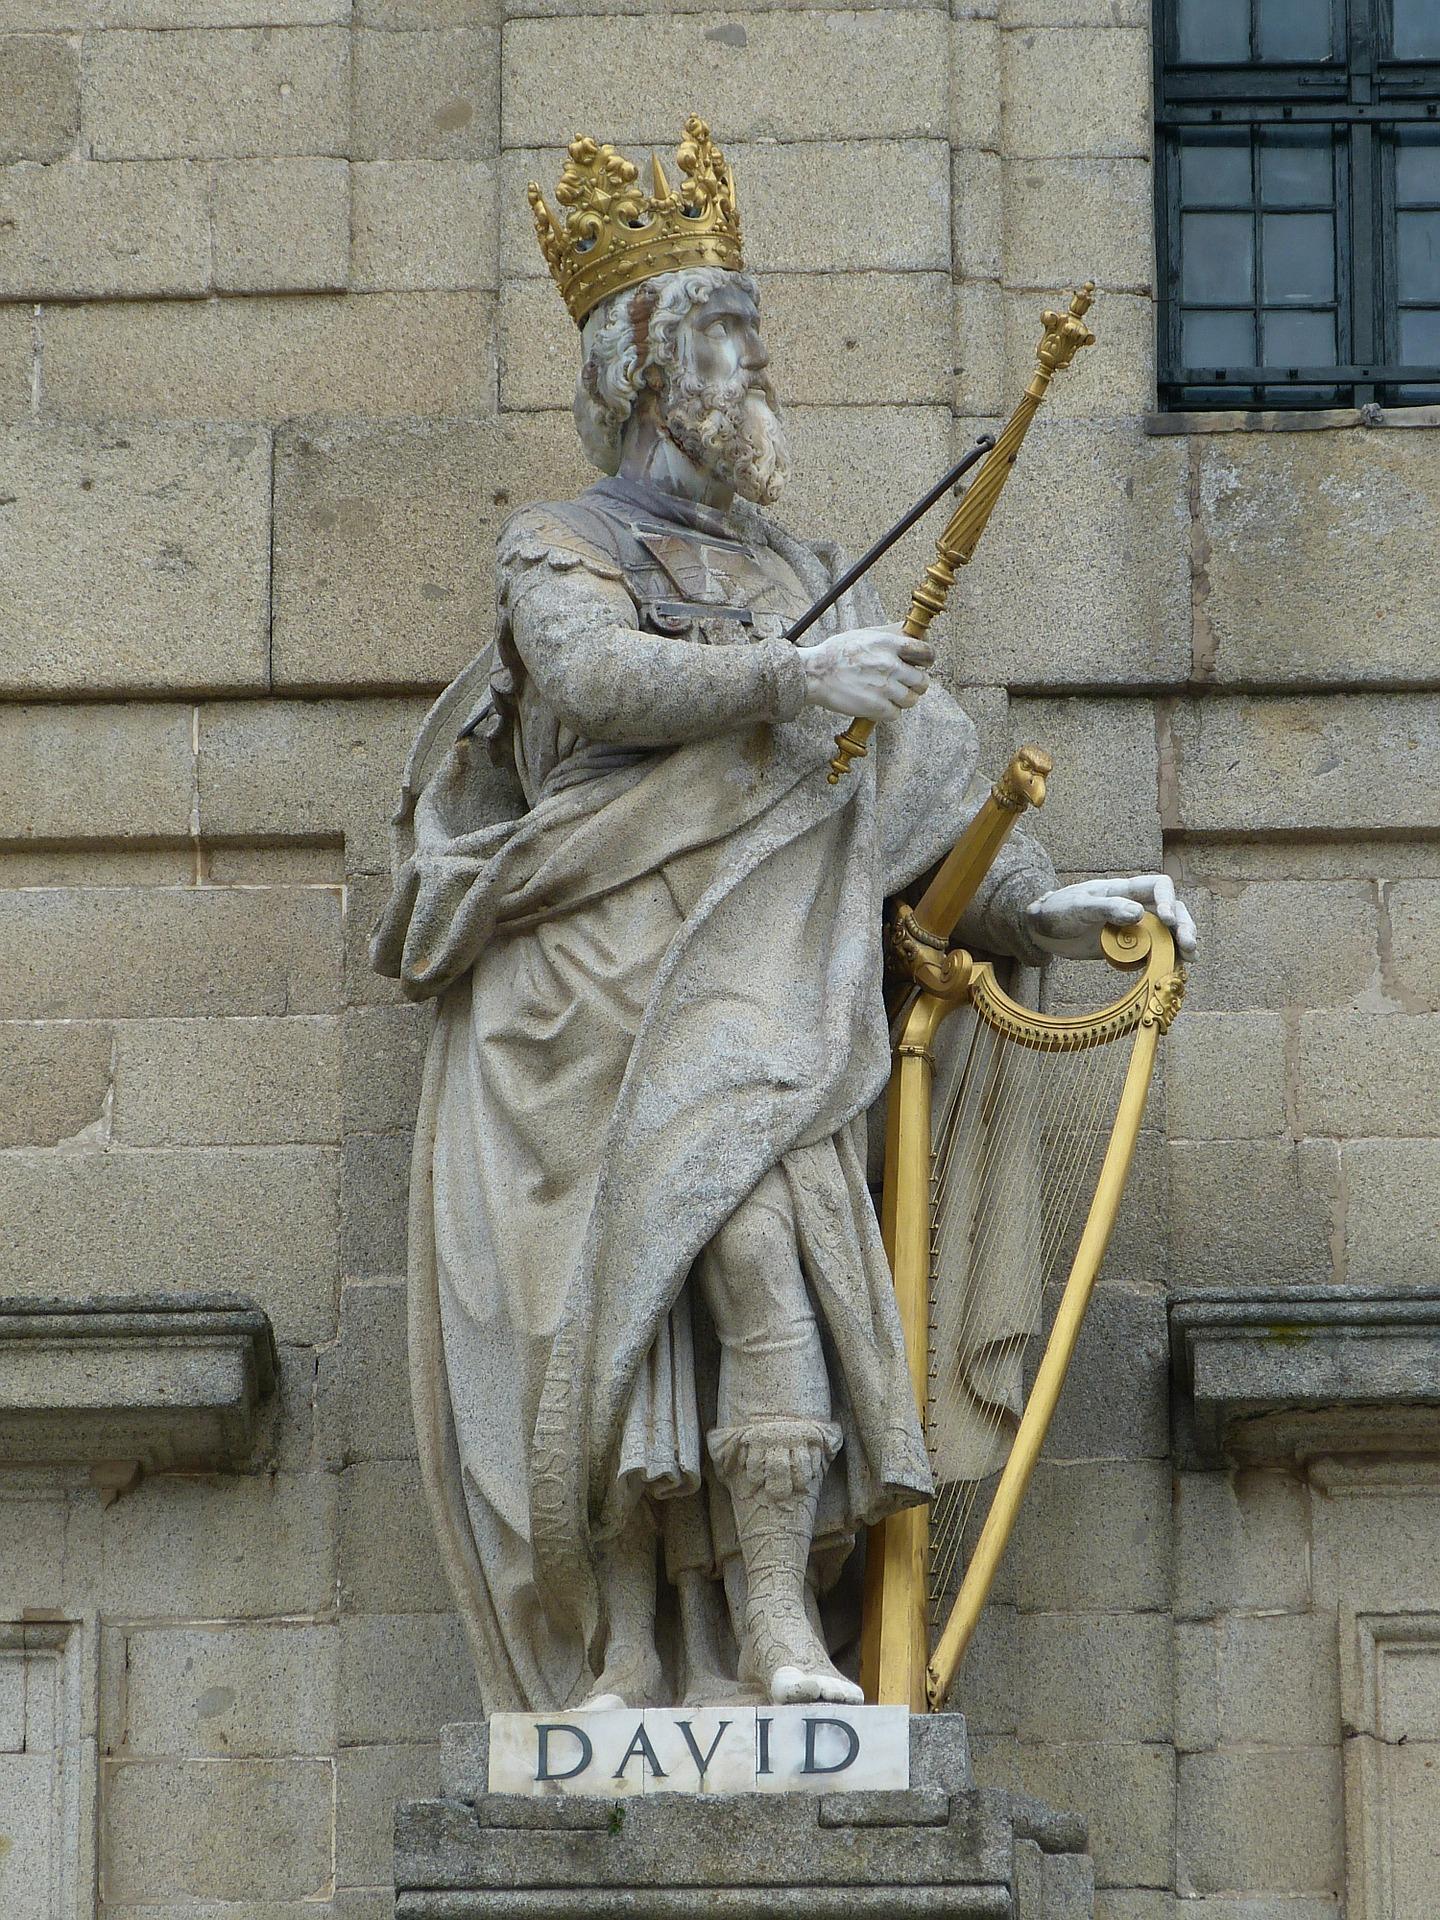 historia del Rey david, San David